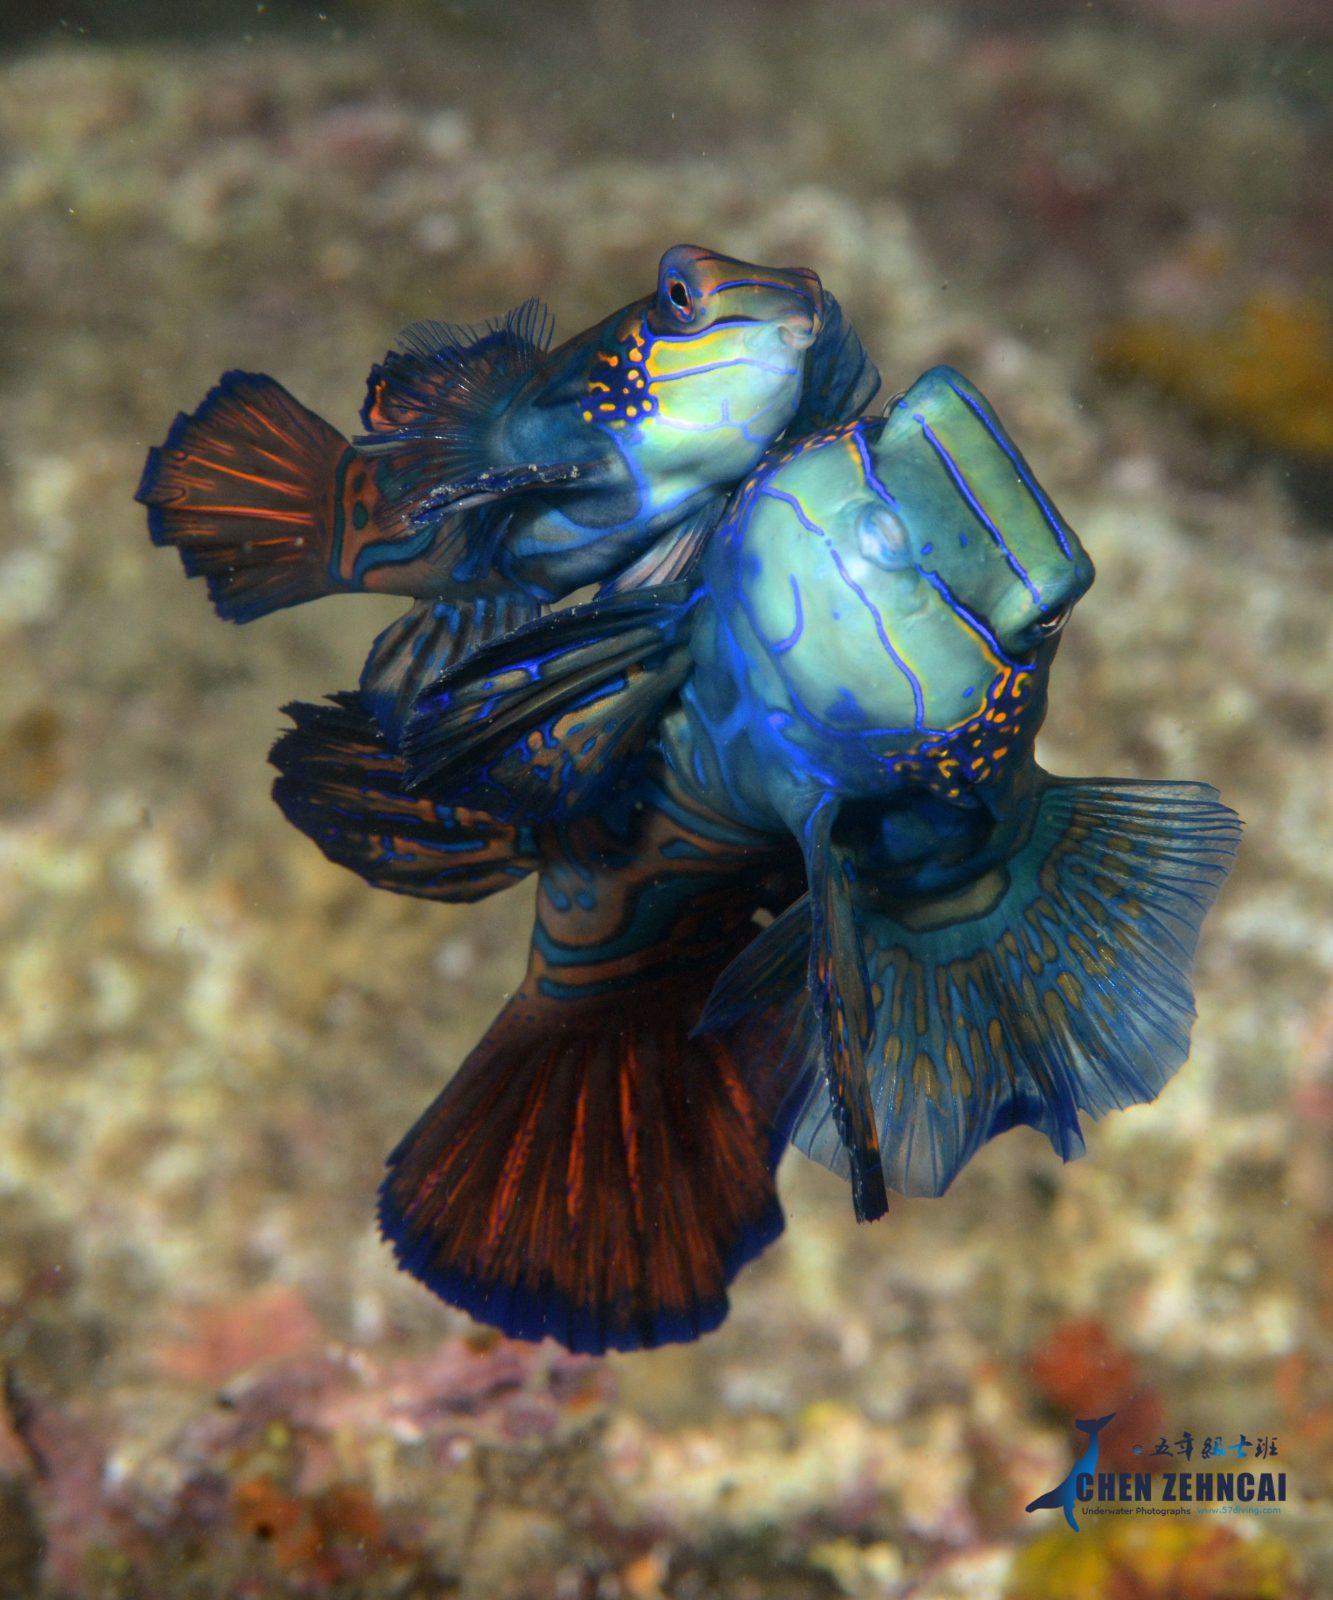 Manadarin fish, Lembeh Strait, Indonesia